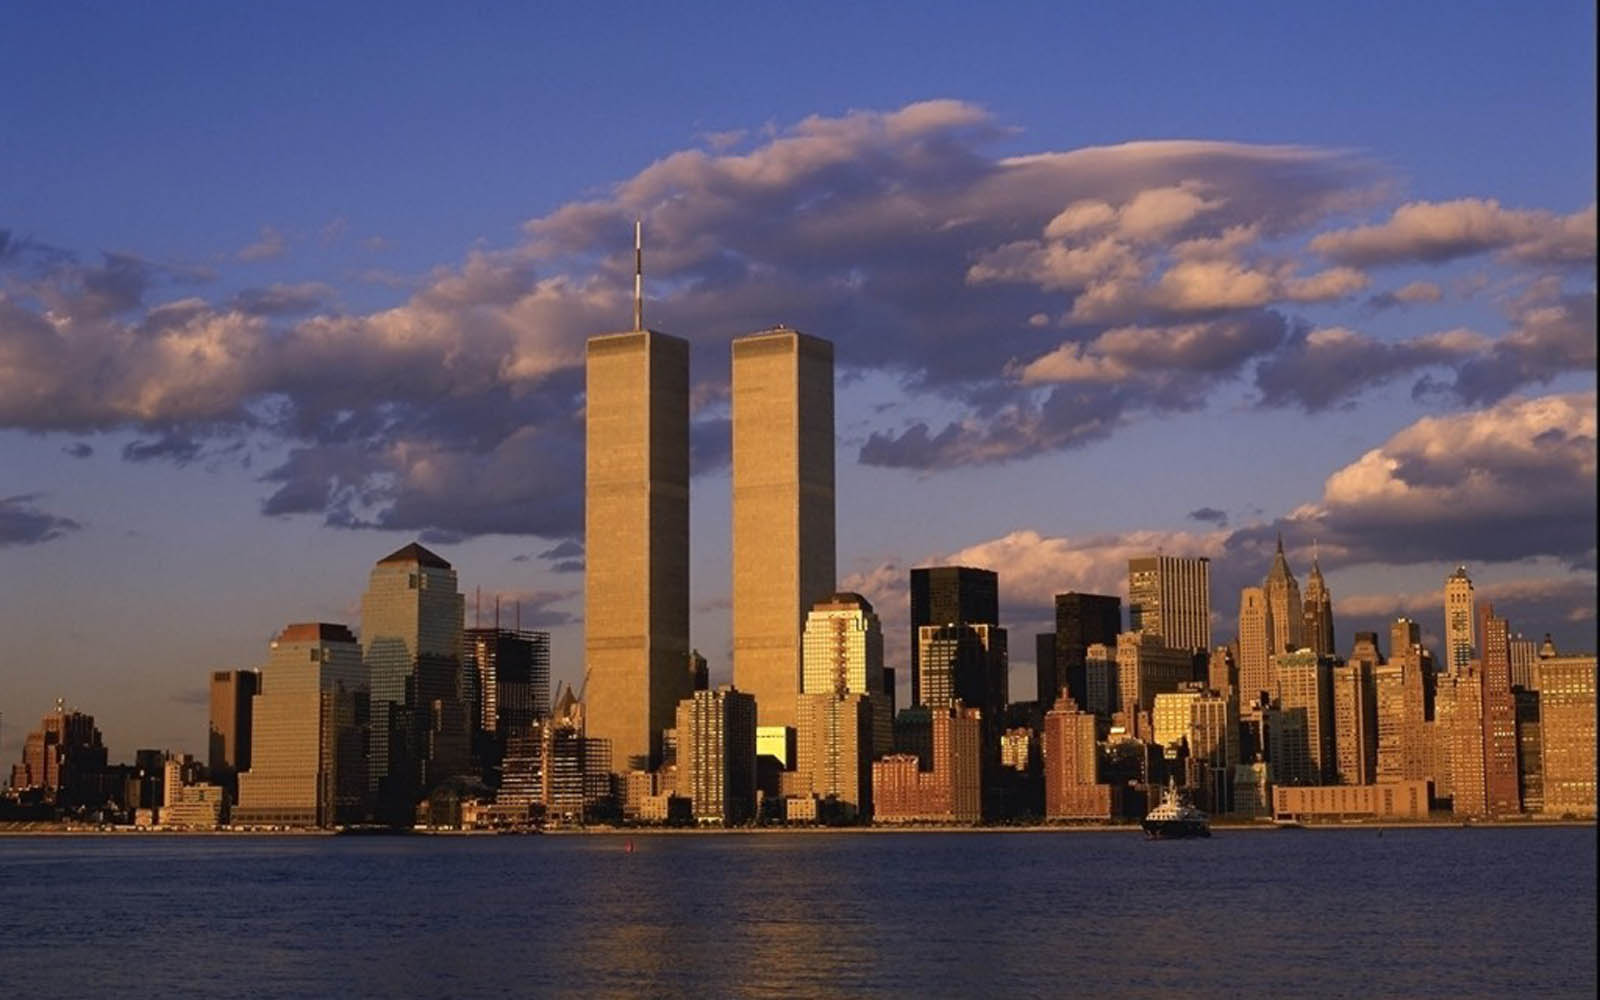 new york manhattan - photo #2